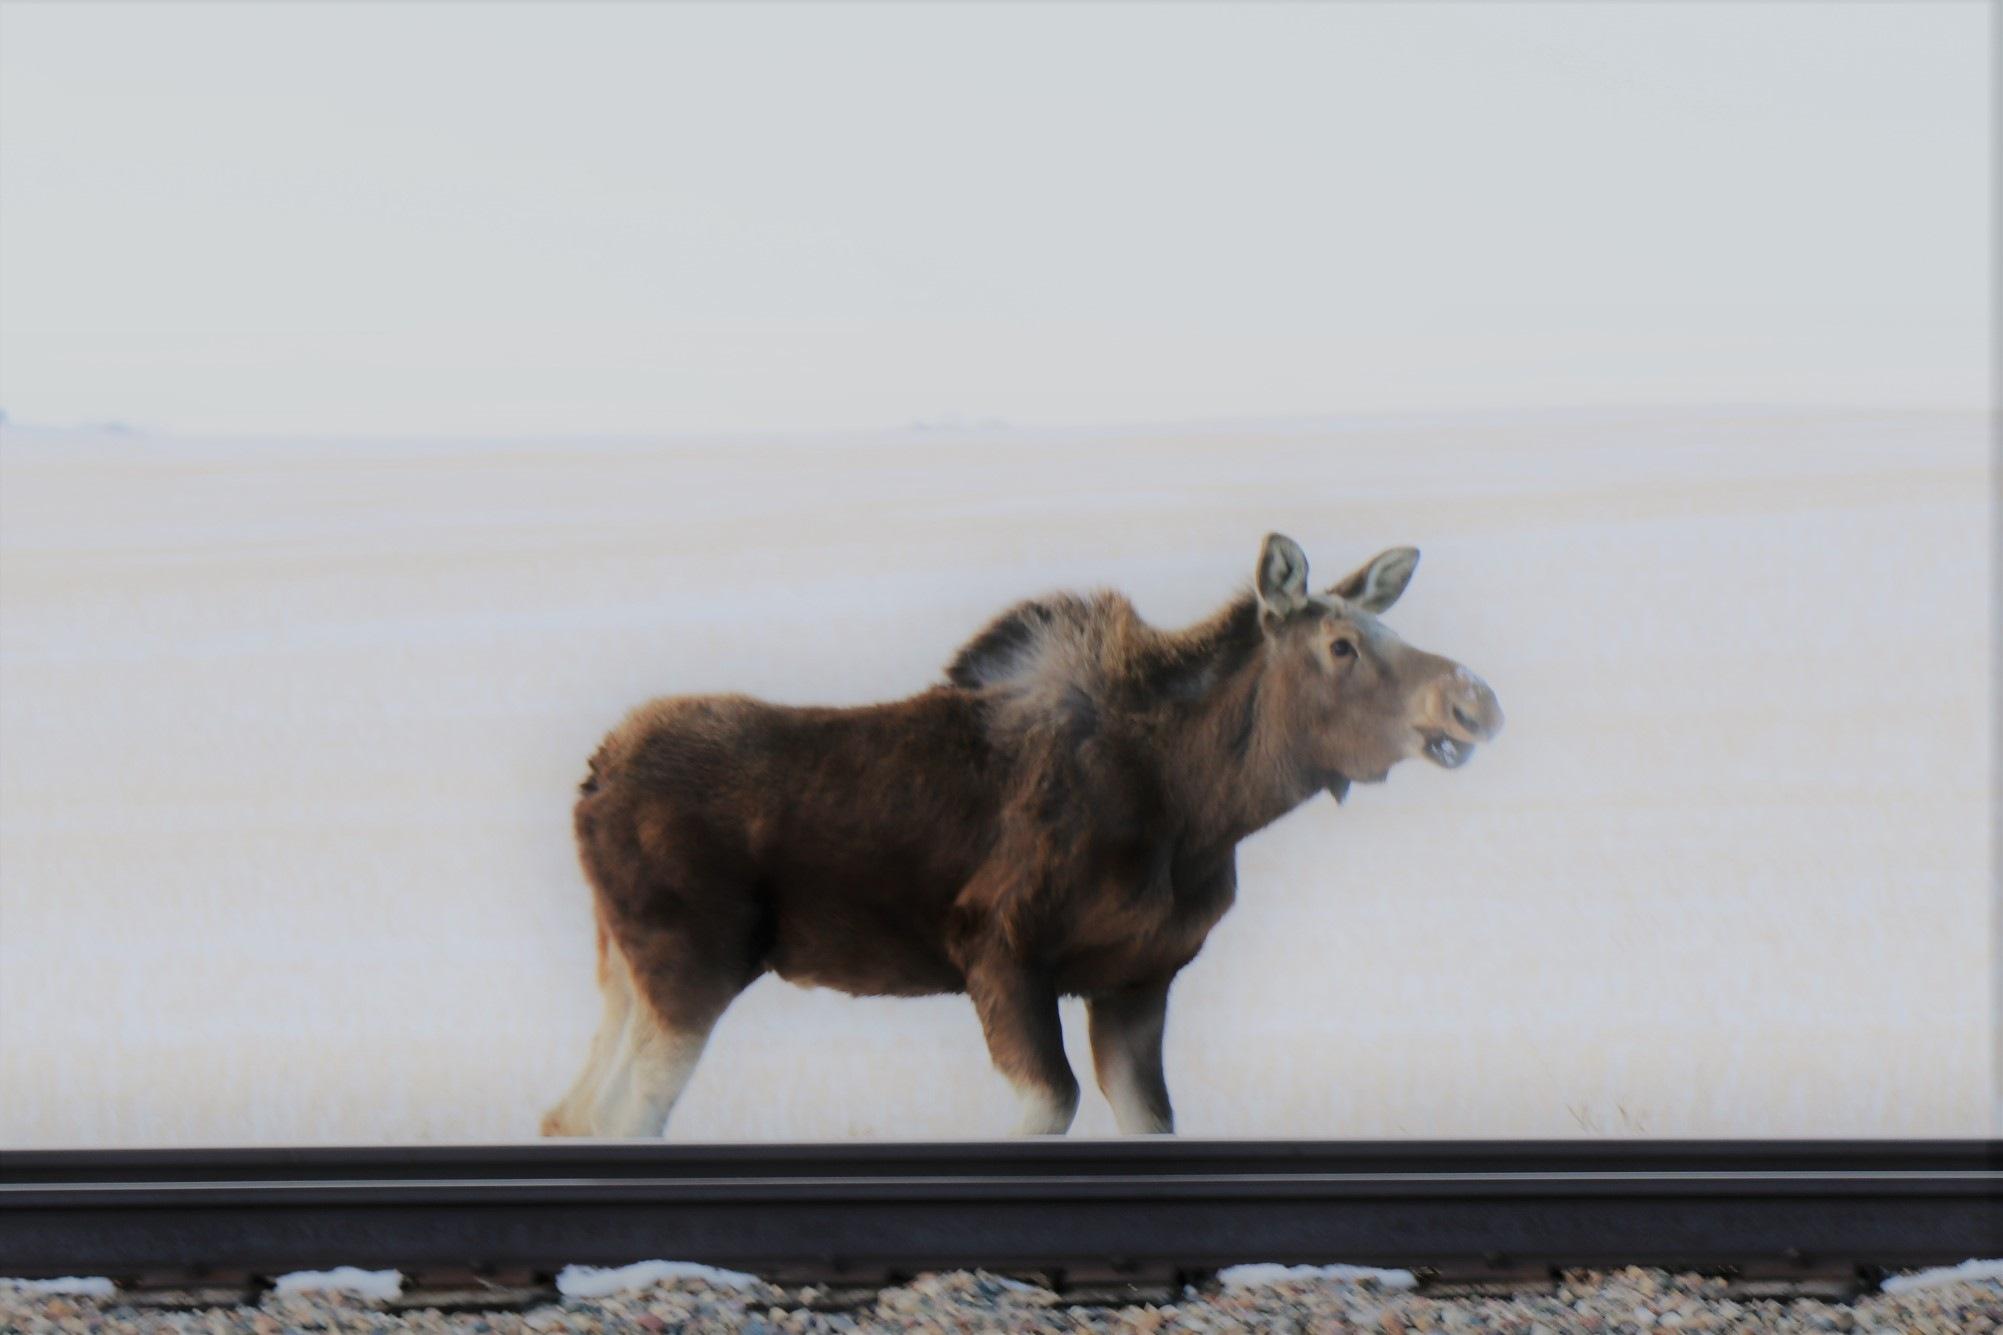 moose on loose by Rhyland Cottingham